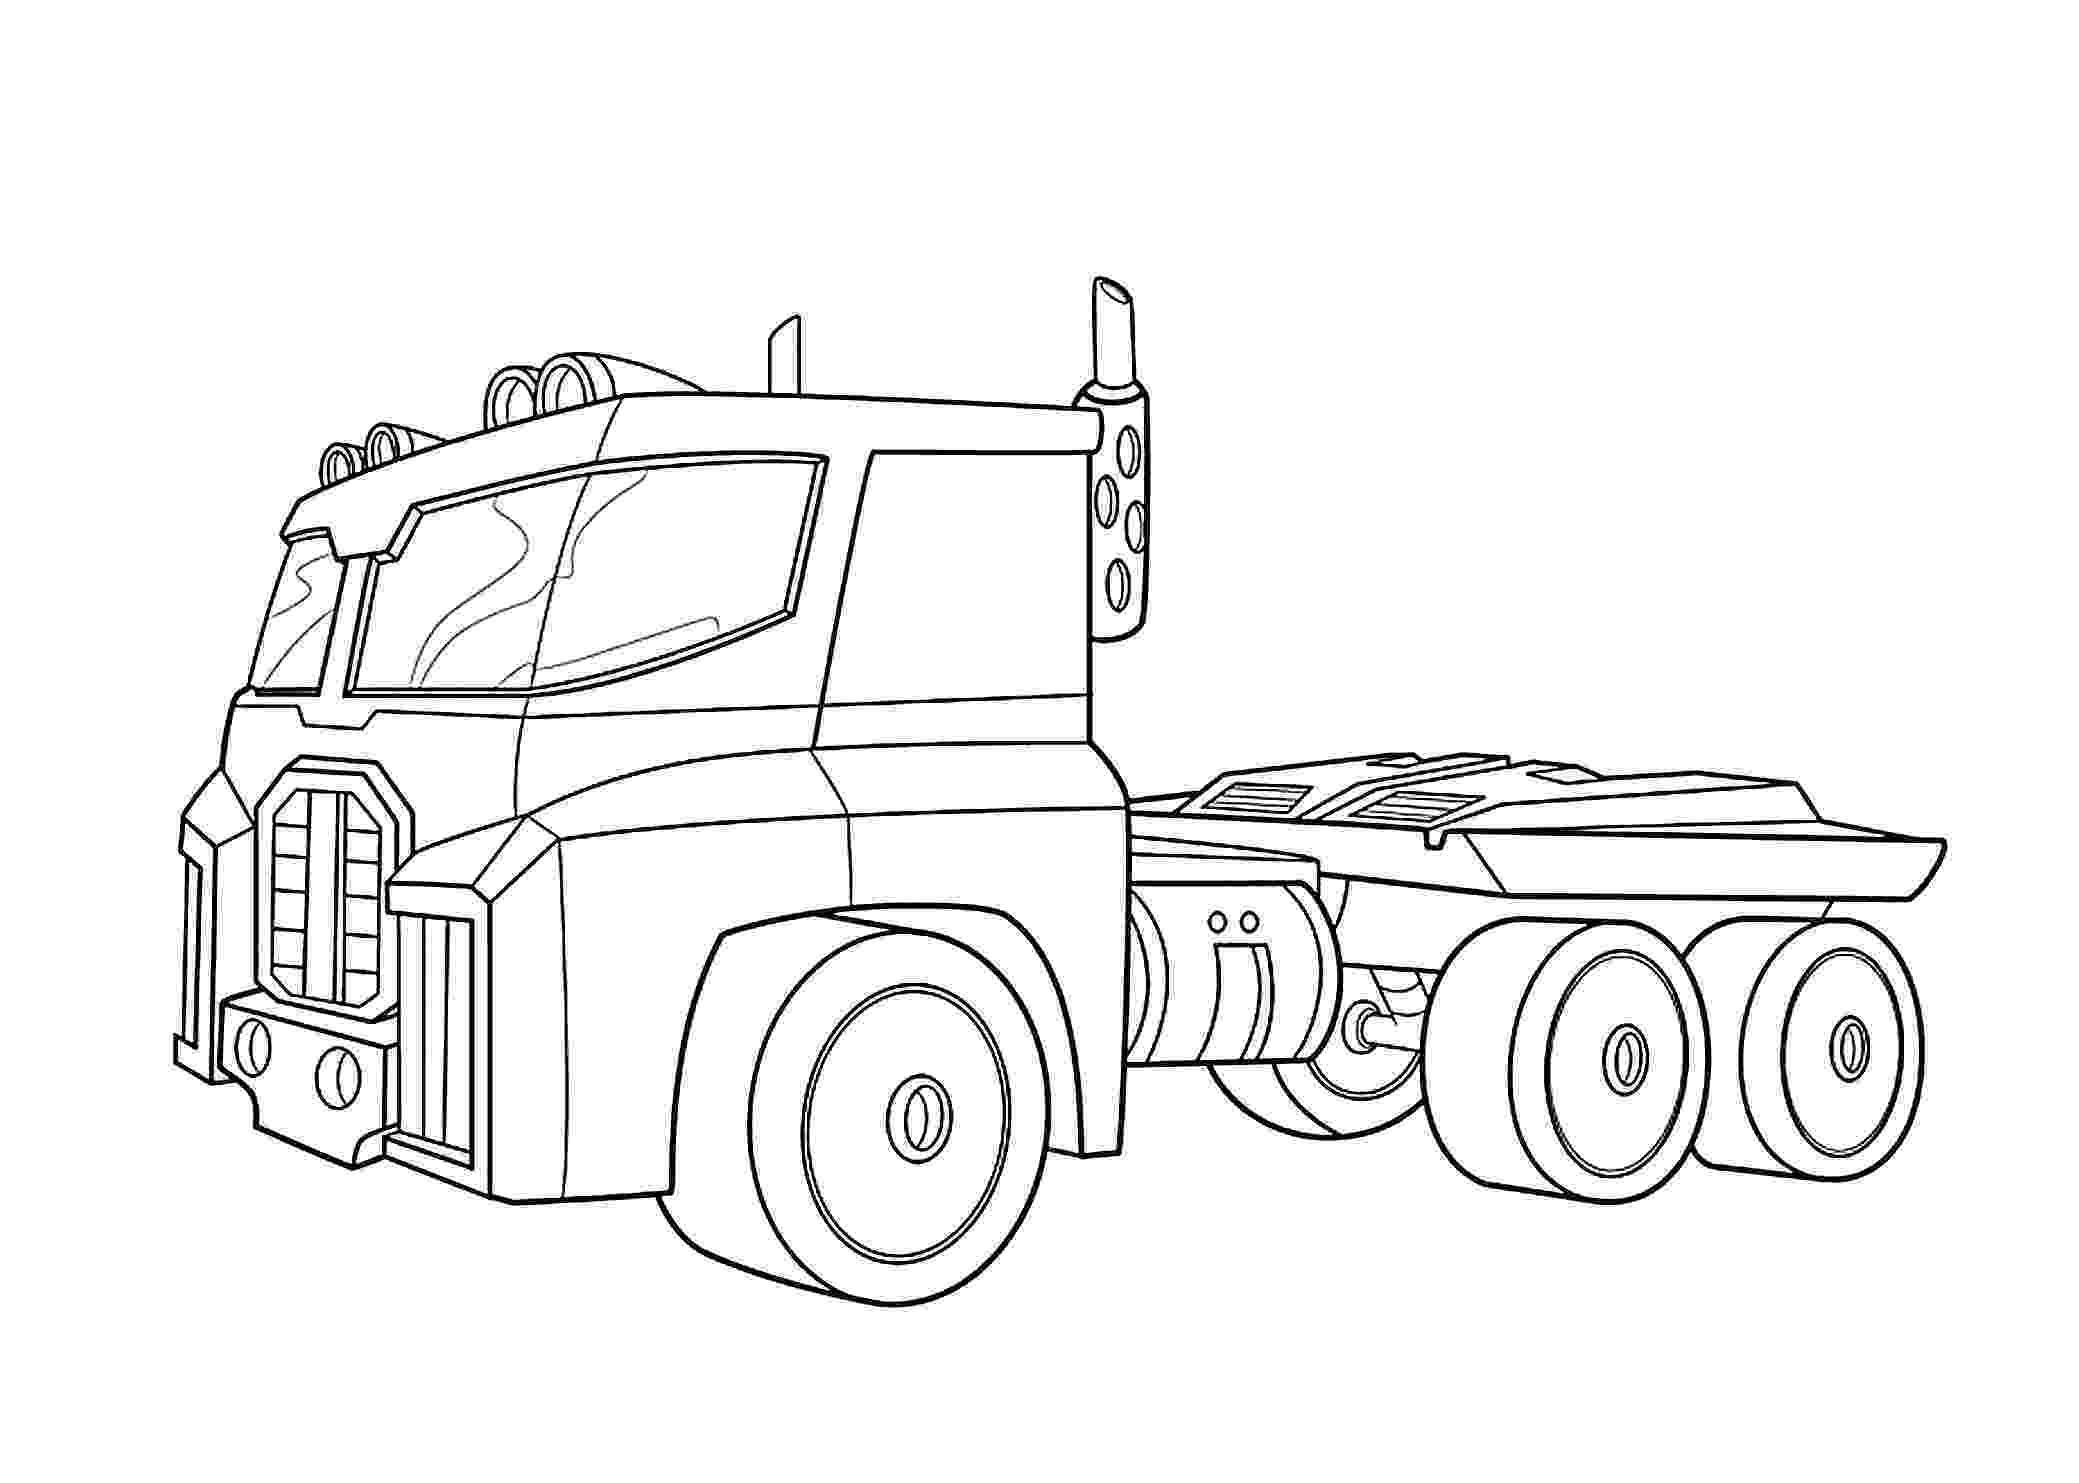 coloring pages of semi trucks semi truck coloring pages to print free coloring books coloring pages semi of trucks